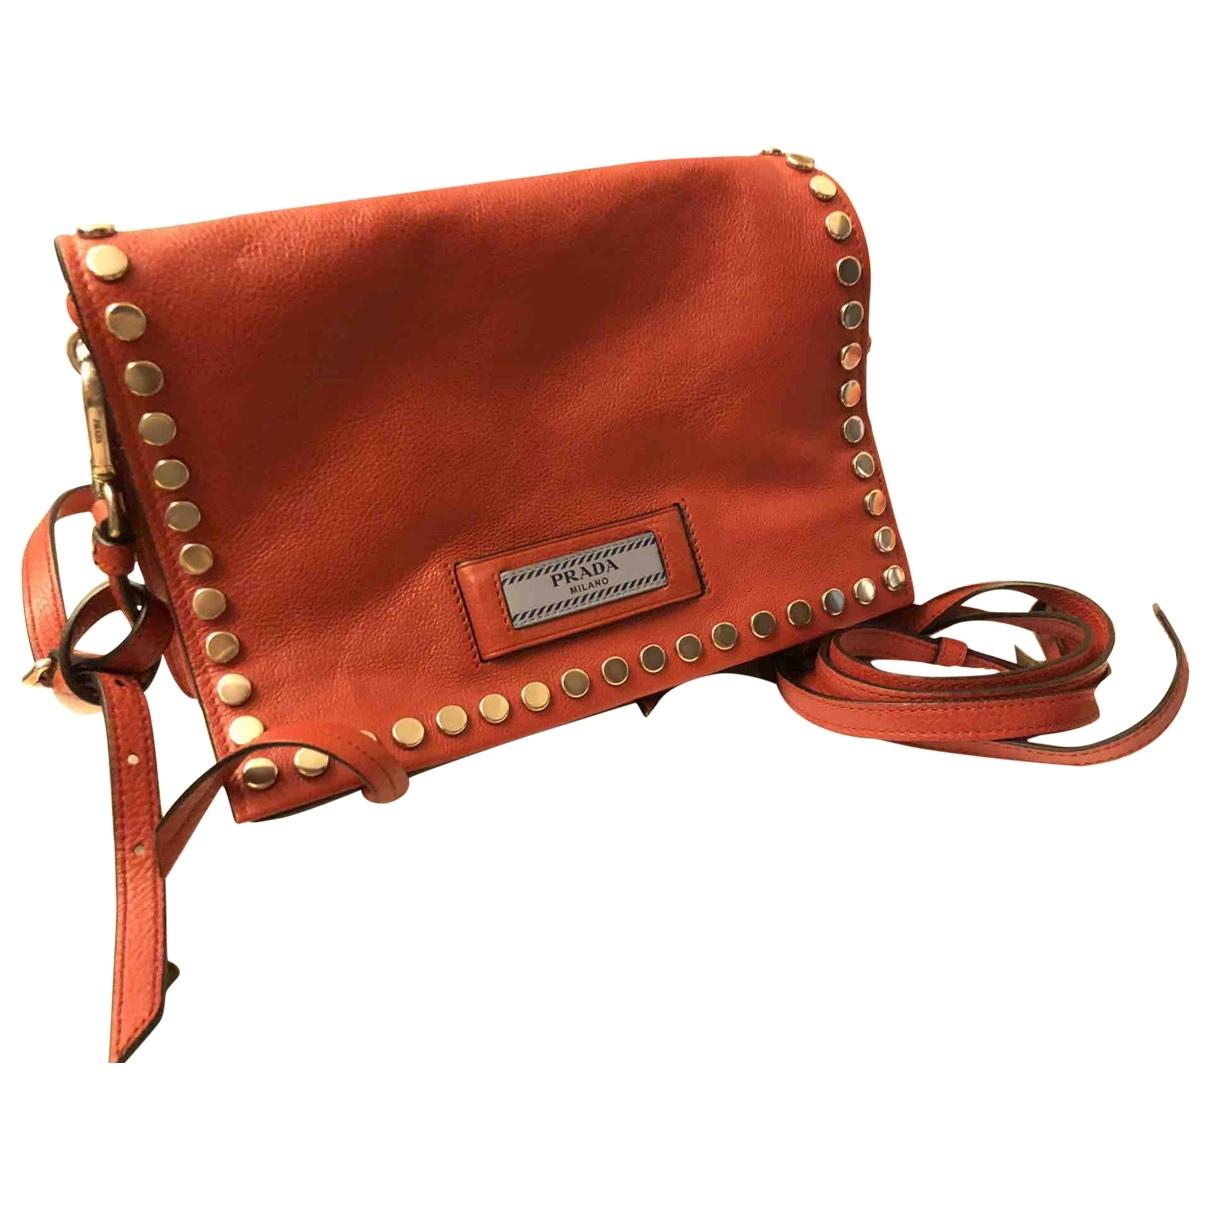 Prada - Sac a main Etiquette pour femme en cuir - rouge